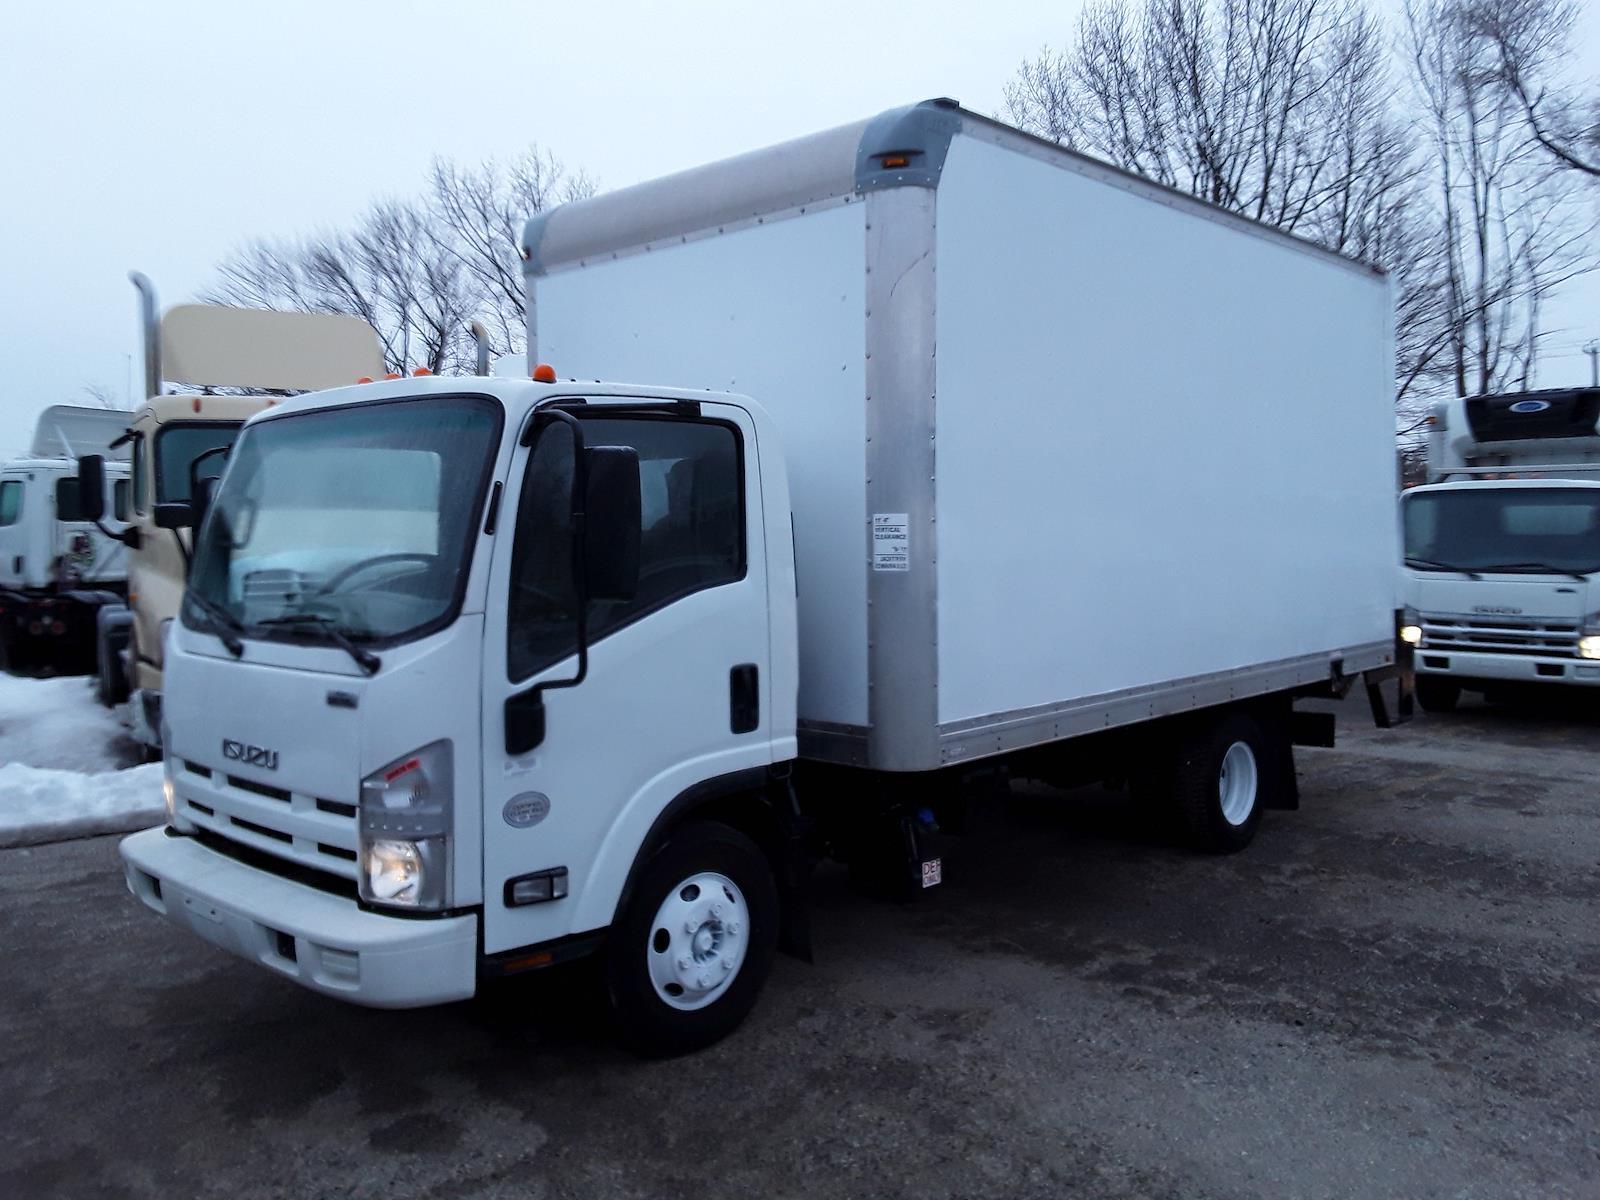 2015 Isuzu NPR-HD Regular Cab 4x2, Dry Freight #389828 - photo 1